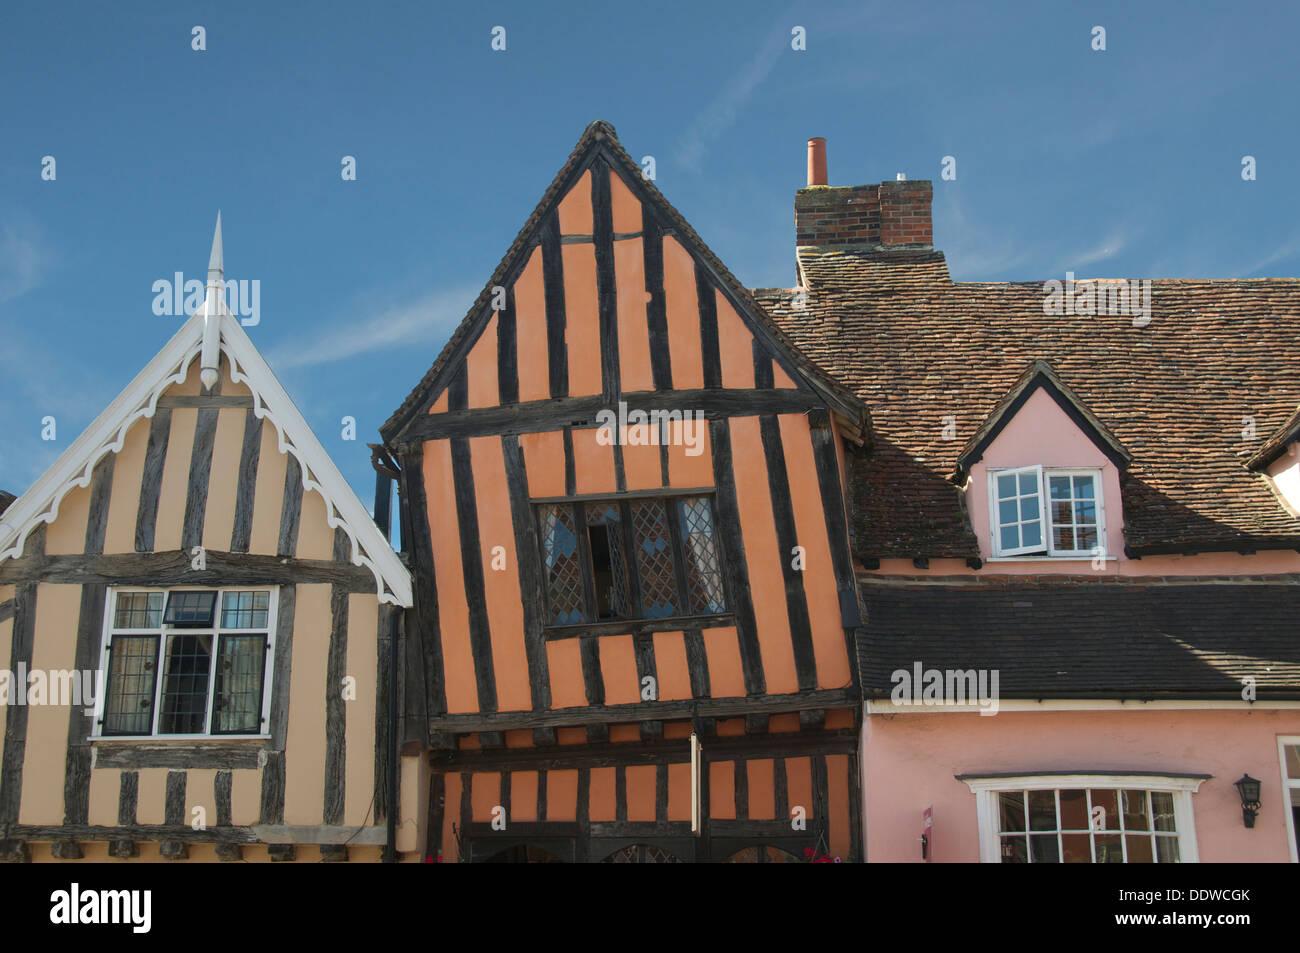 Crooked House High Street Lavenham Suffolk England - Stock Image